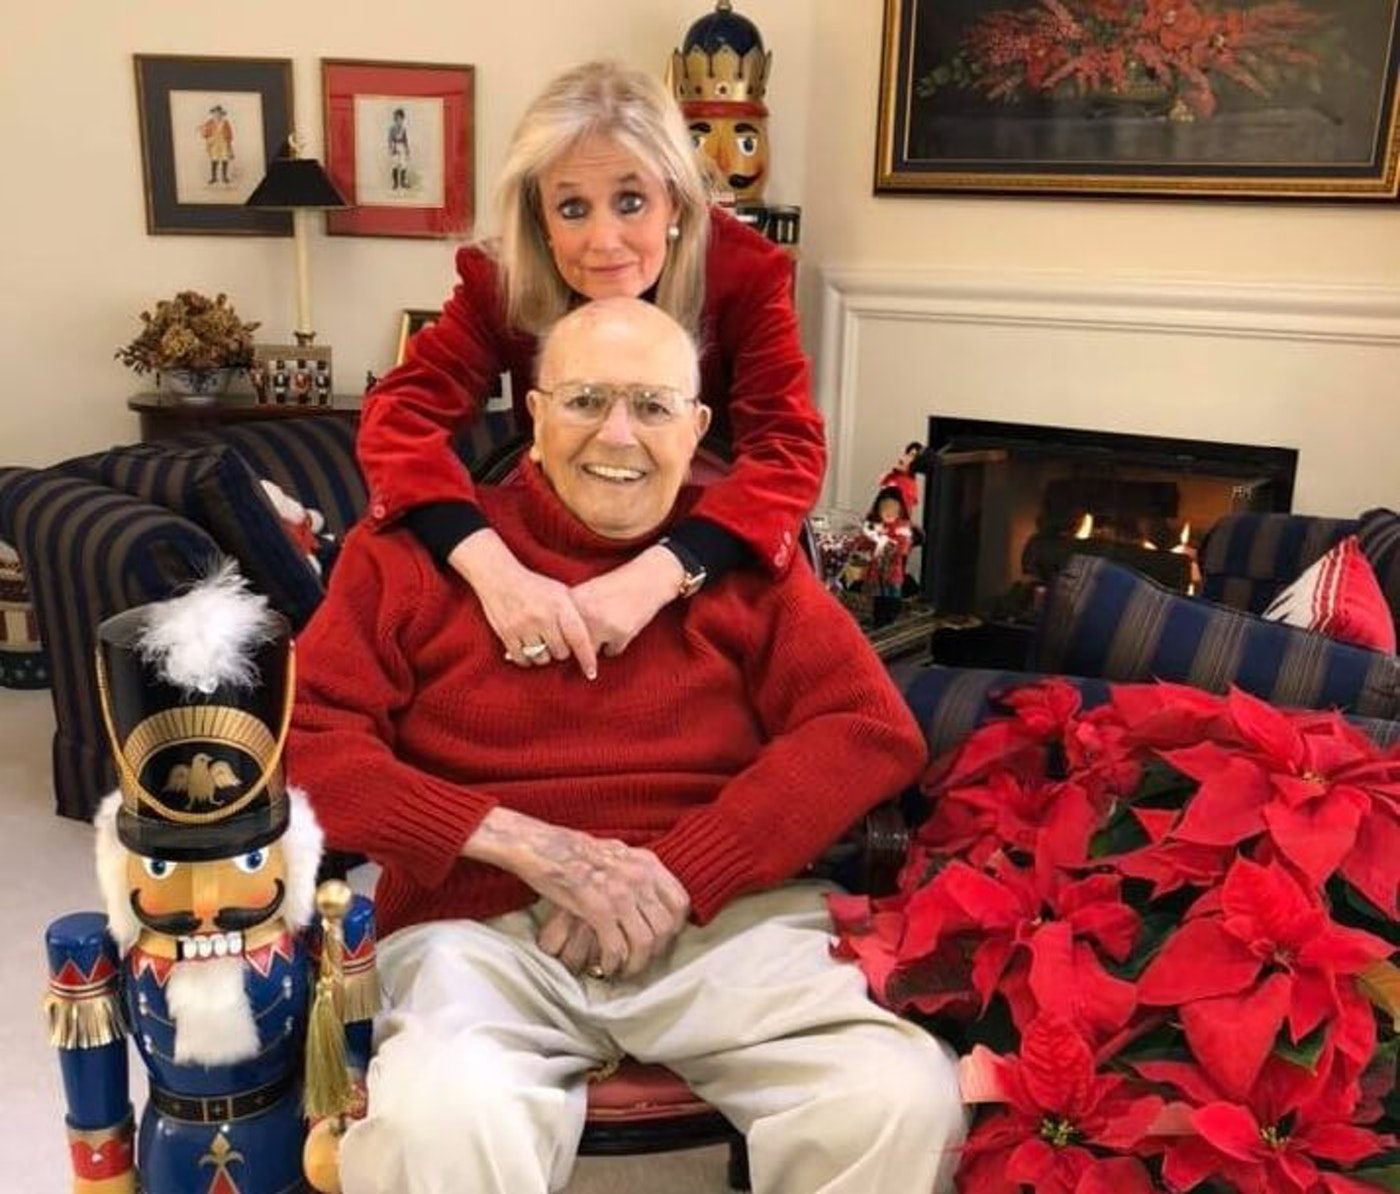 John and Debbie Dingell